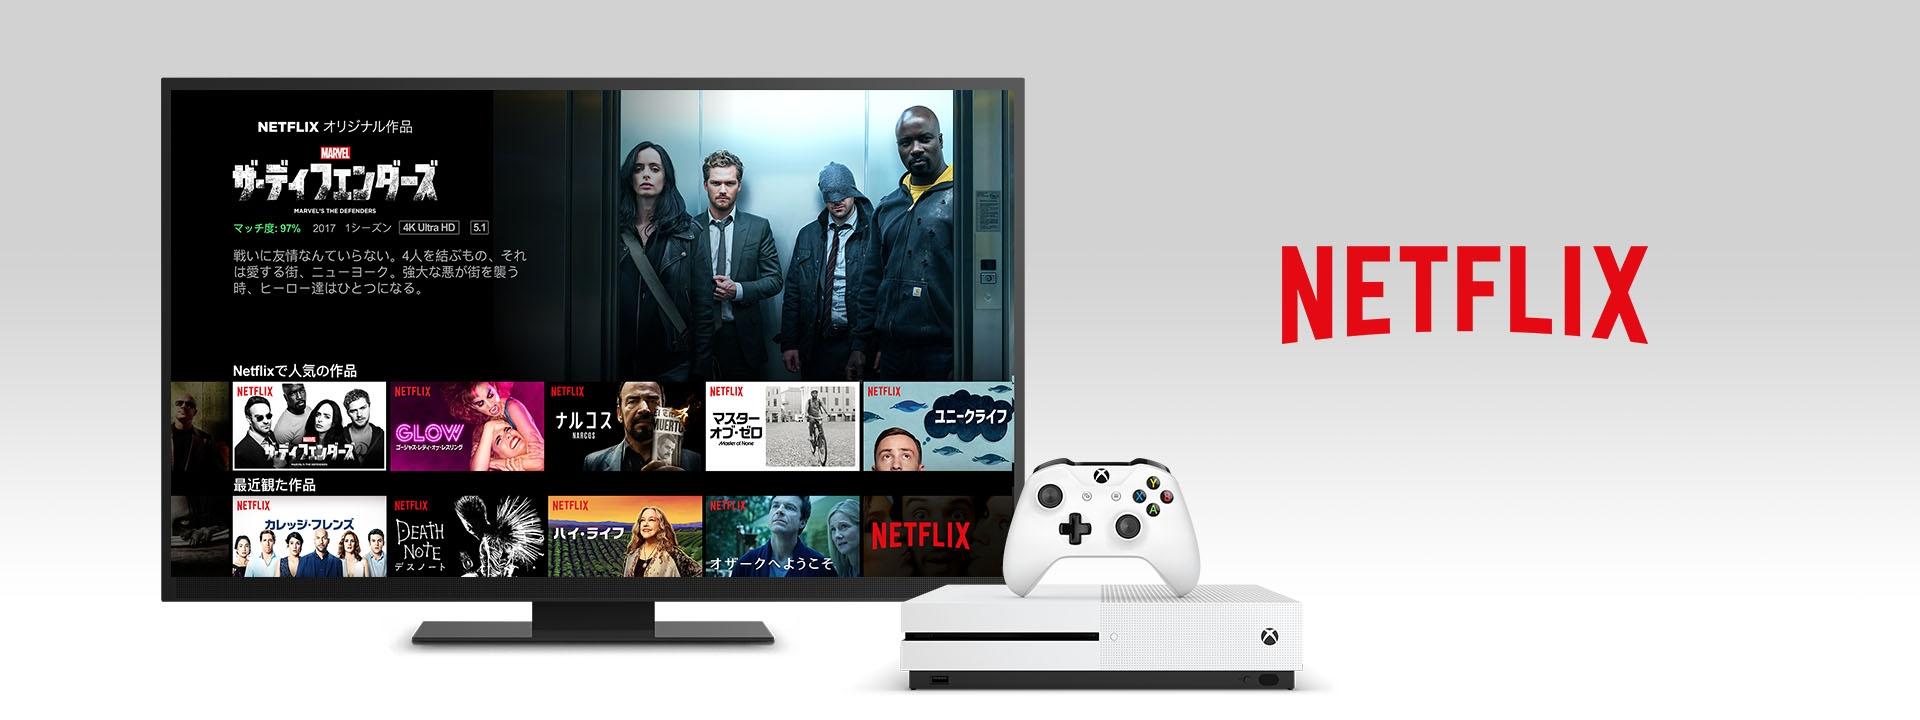 Xbox One 版 Netflix